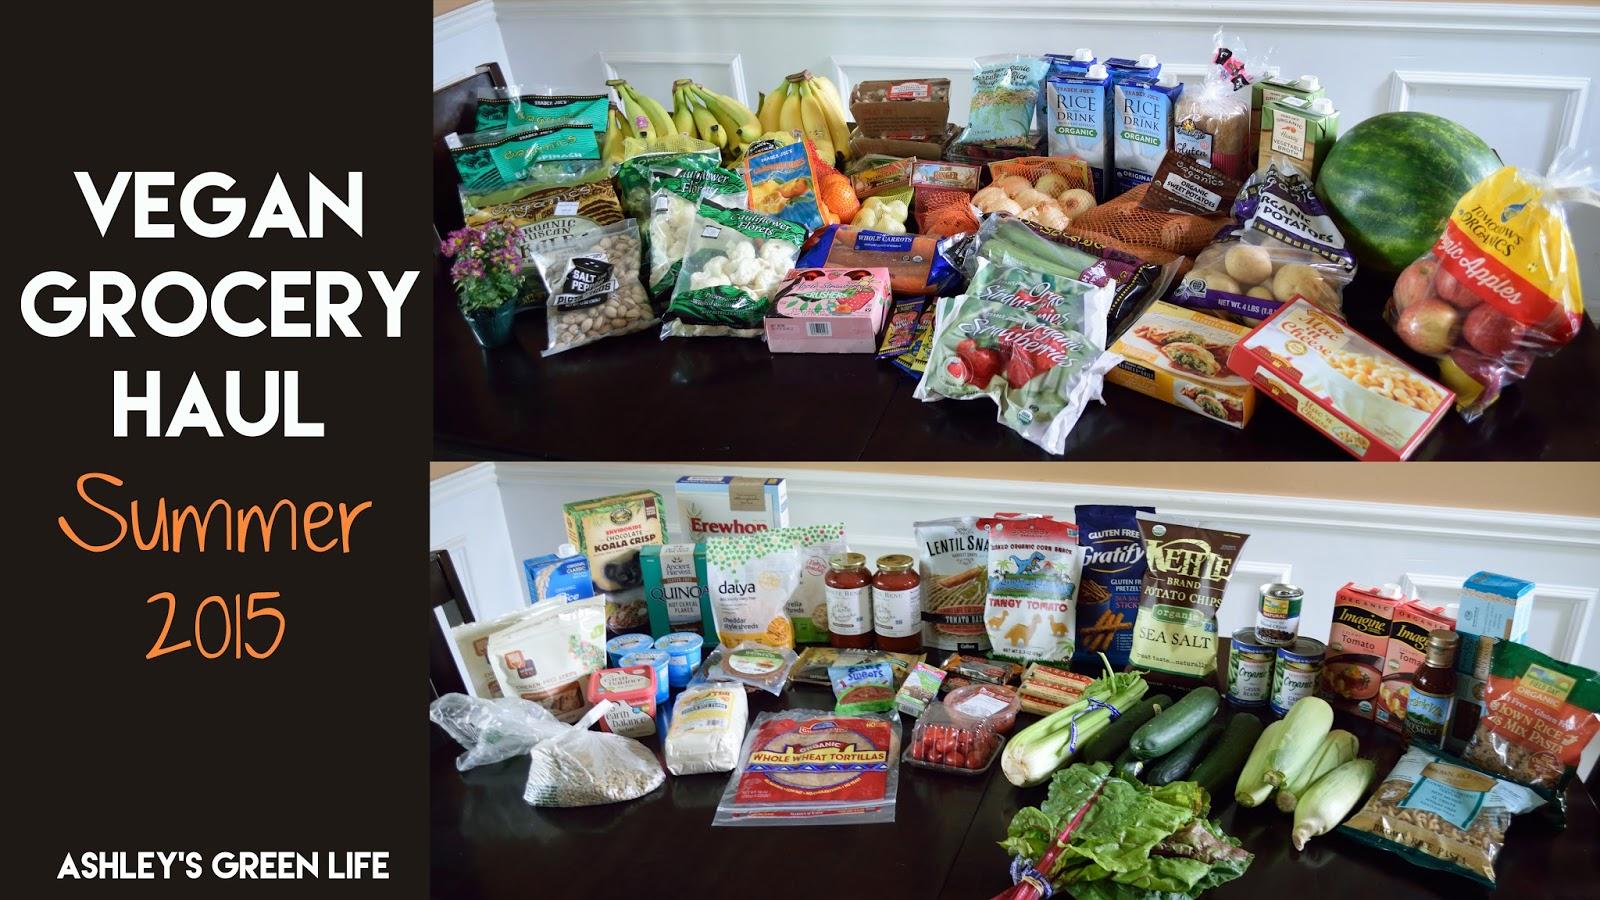 Ashley's Green Life: Vegan Grocery Haul: Summer 2015